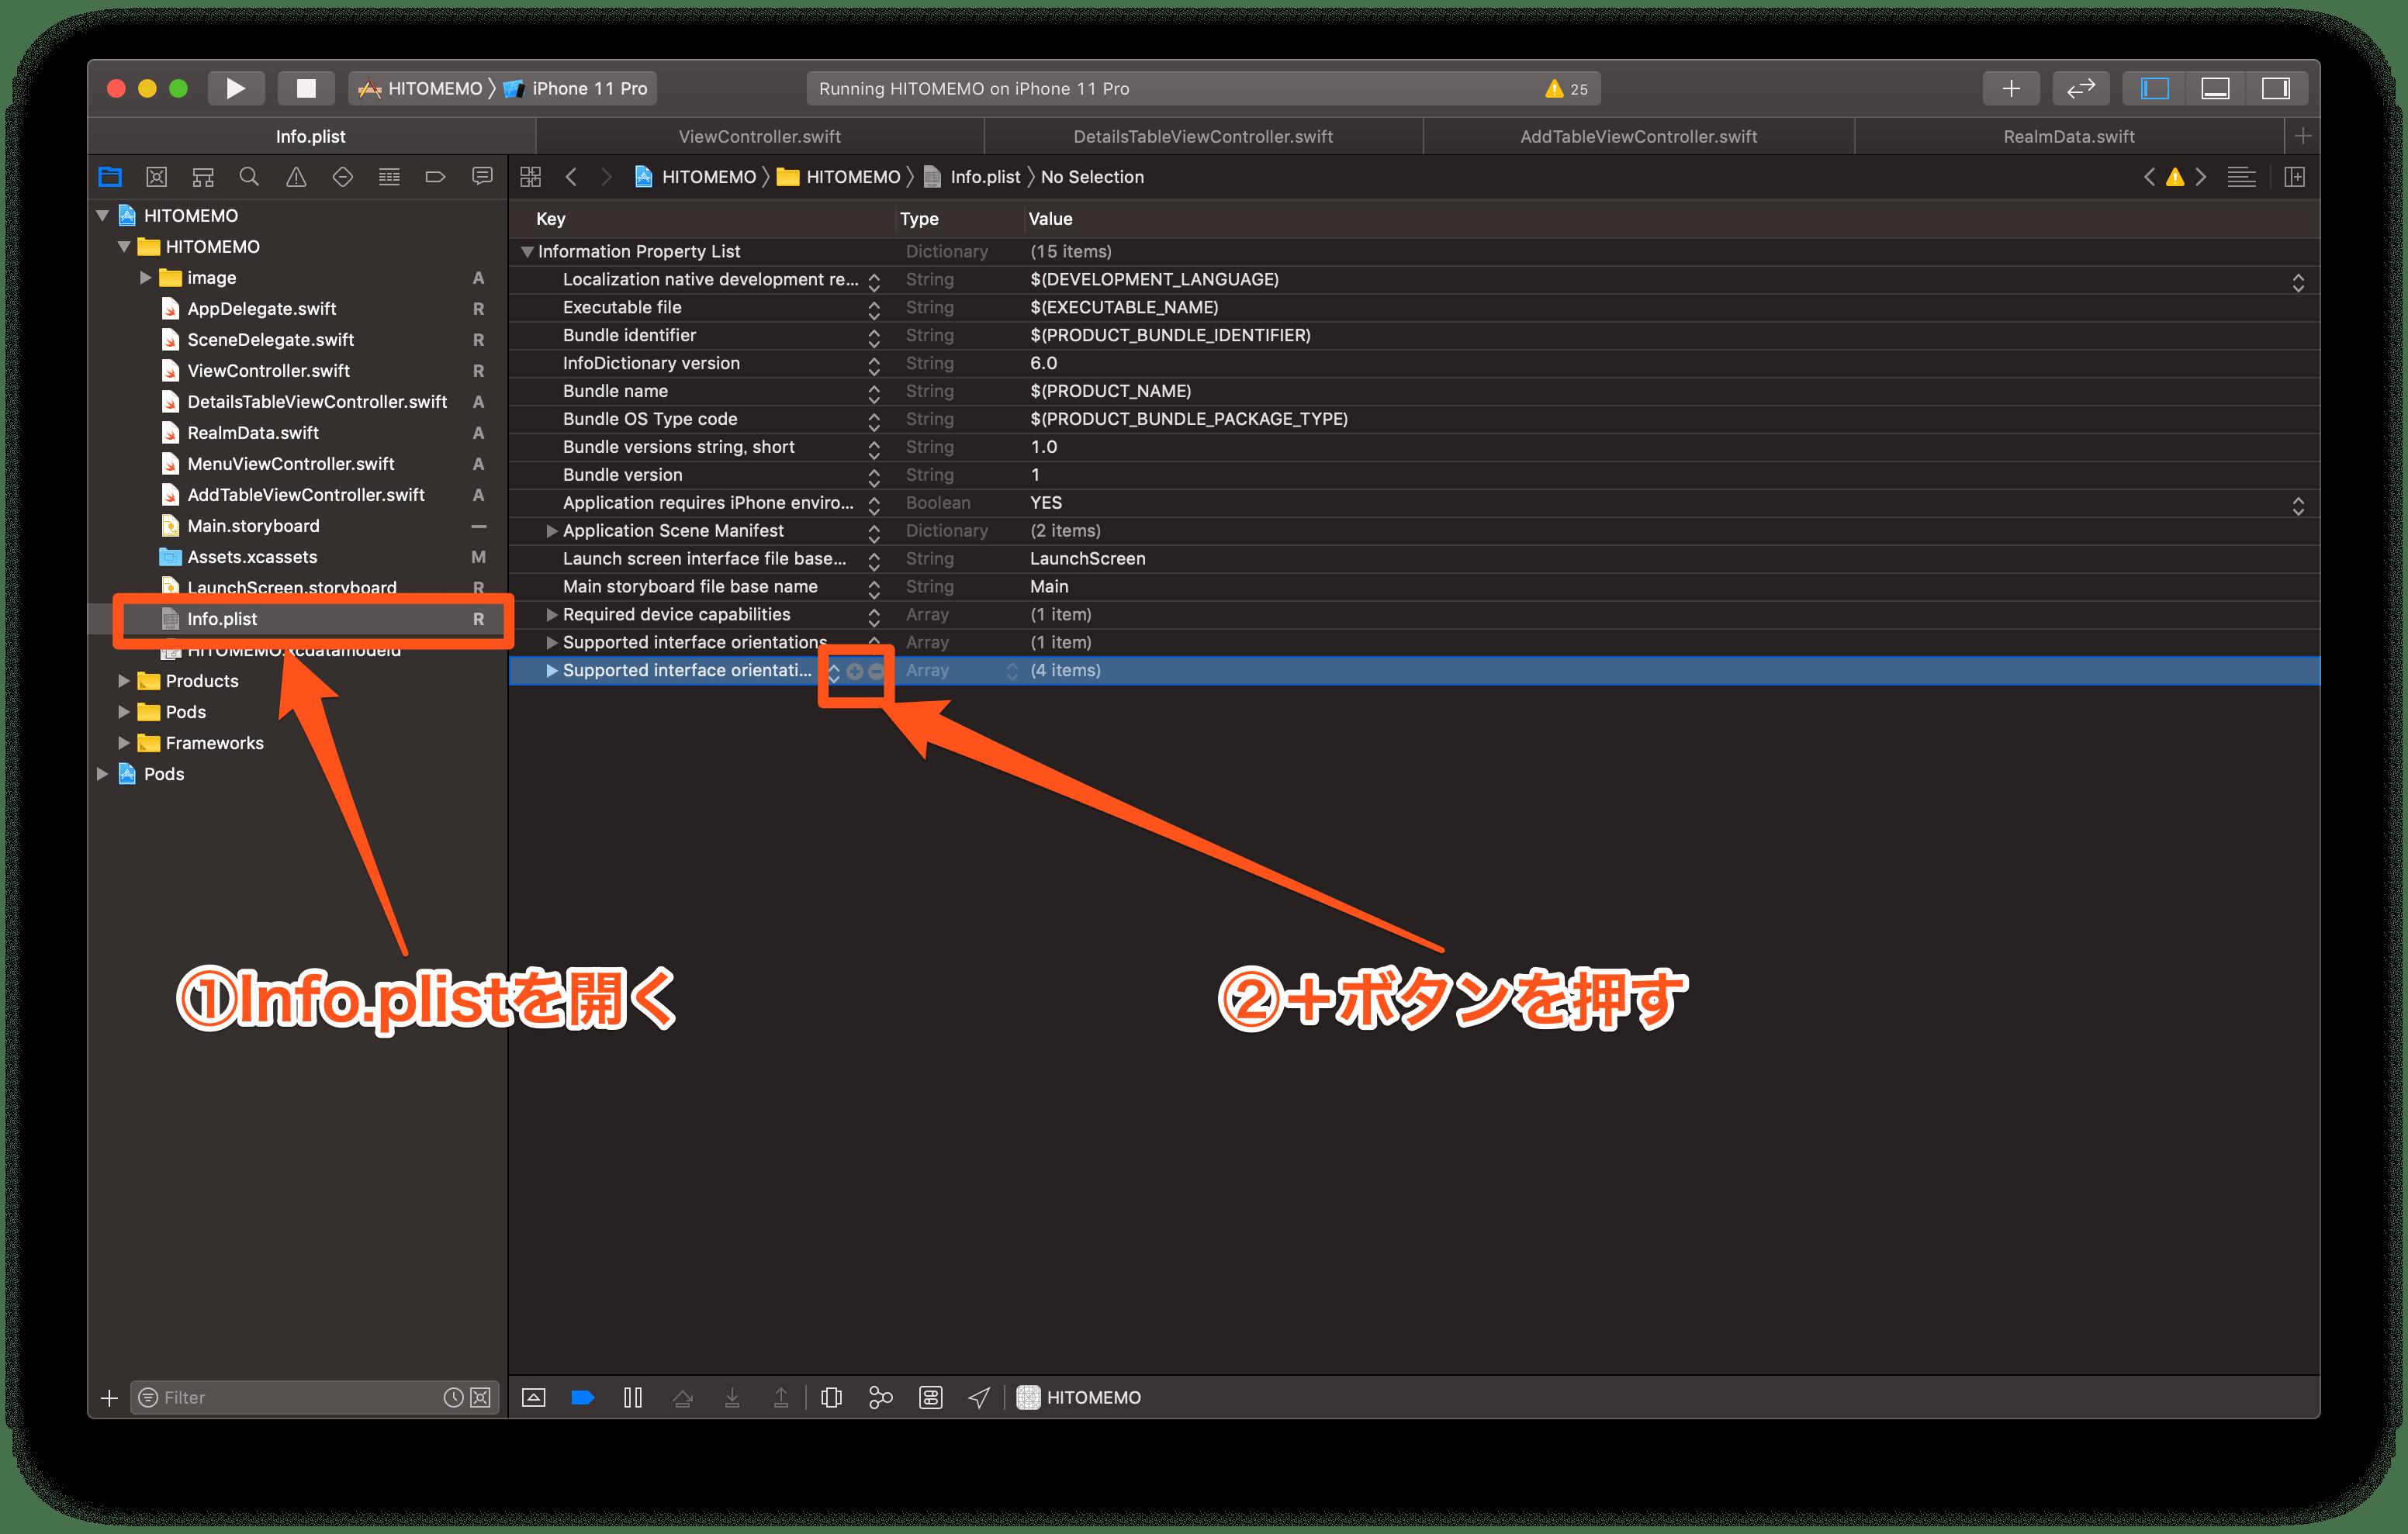 info.plistを開き、+ボタンを押す画像